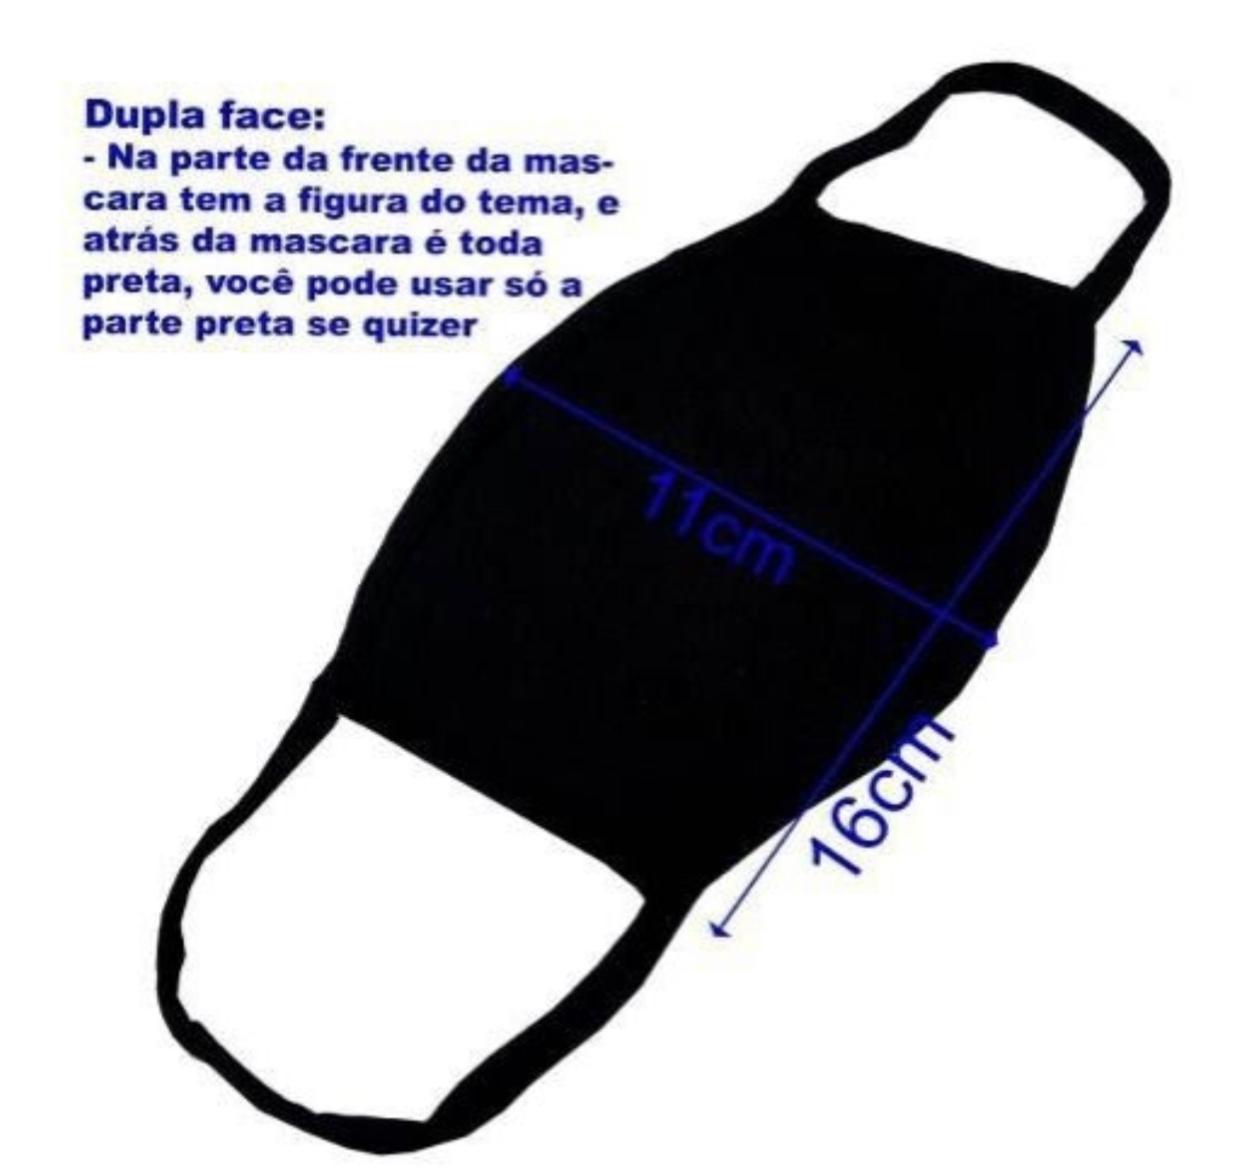 Máscara de Tecido Personalizada Ratinho & Amigos Lavável Reutilizável